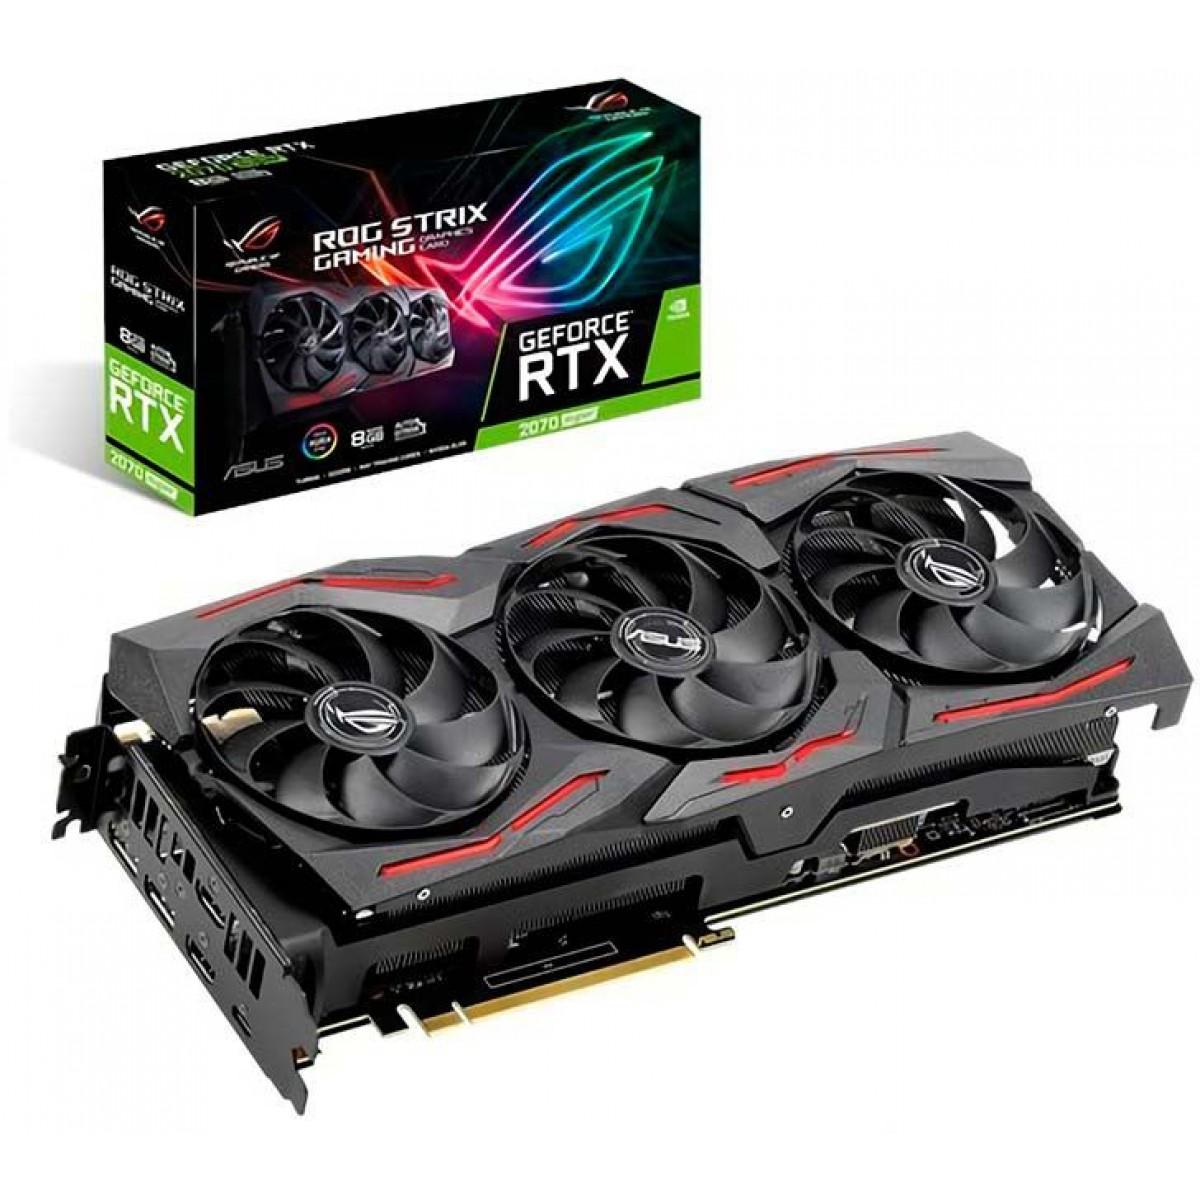 Placa de Vídeo Asus, Rog Strix GeForce, RTX 2070 Super, 8GB, GDDR6, 256Bit, ROG-STRIX-RTX2070S-8G-GAMING